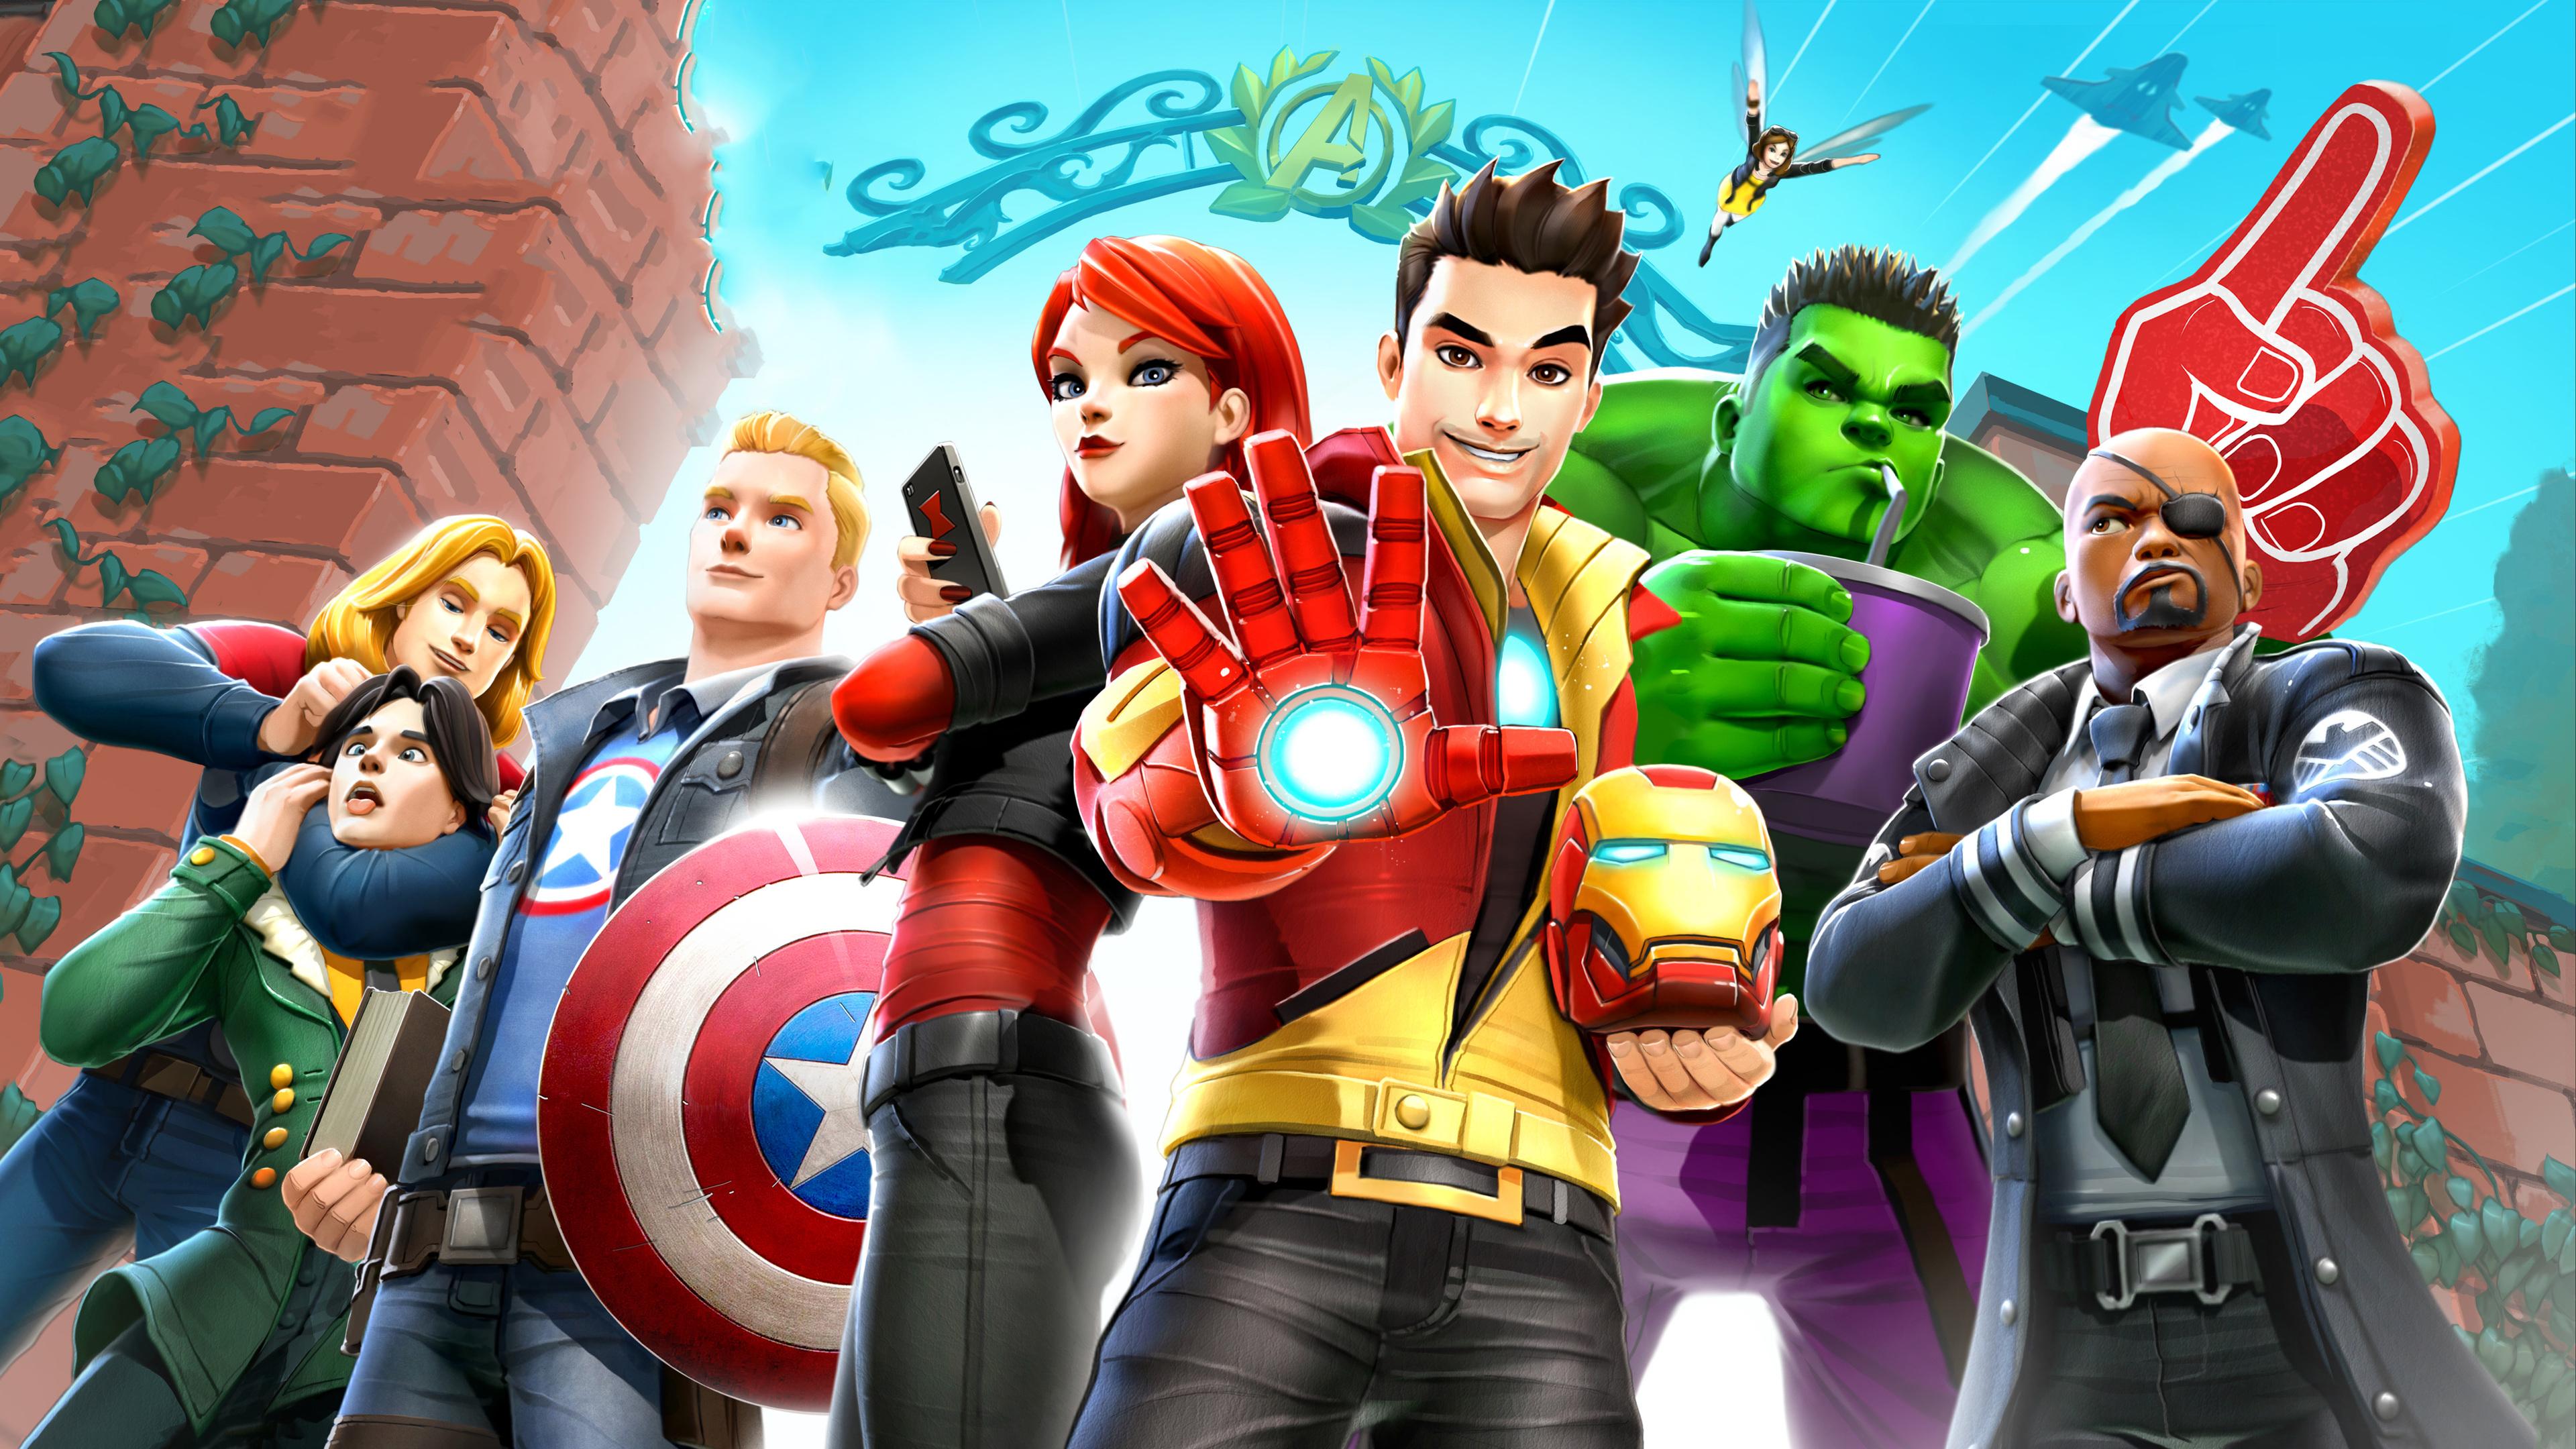 marvel avengers academy 1537691013 - Marvel Avengers Academy - marvel avengers academy wallpapers, hd-wallpapers, games wallpapers, 5k wallpapers, 4k-wallpapers